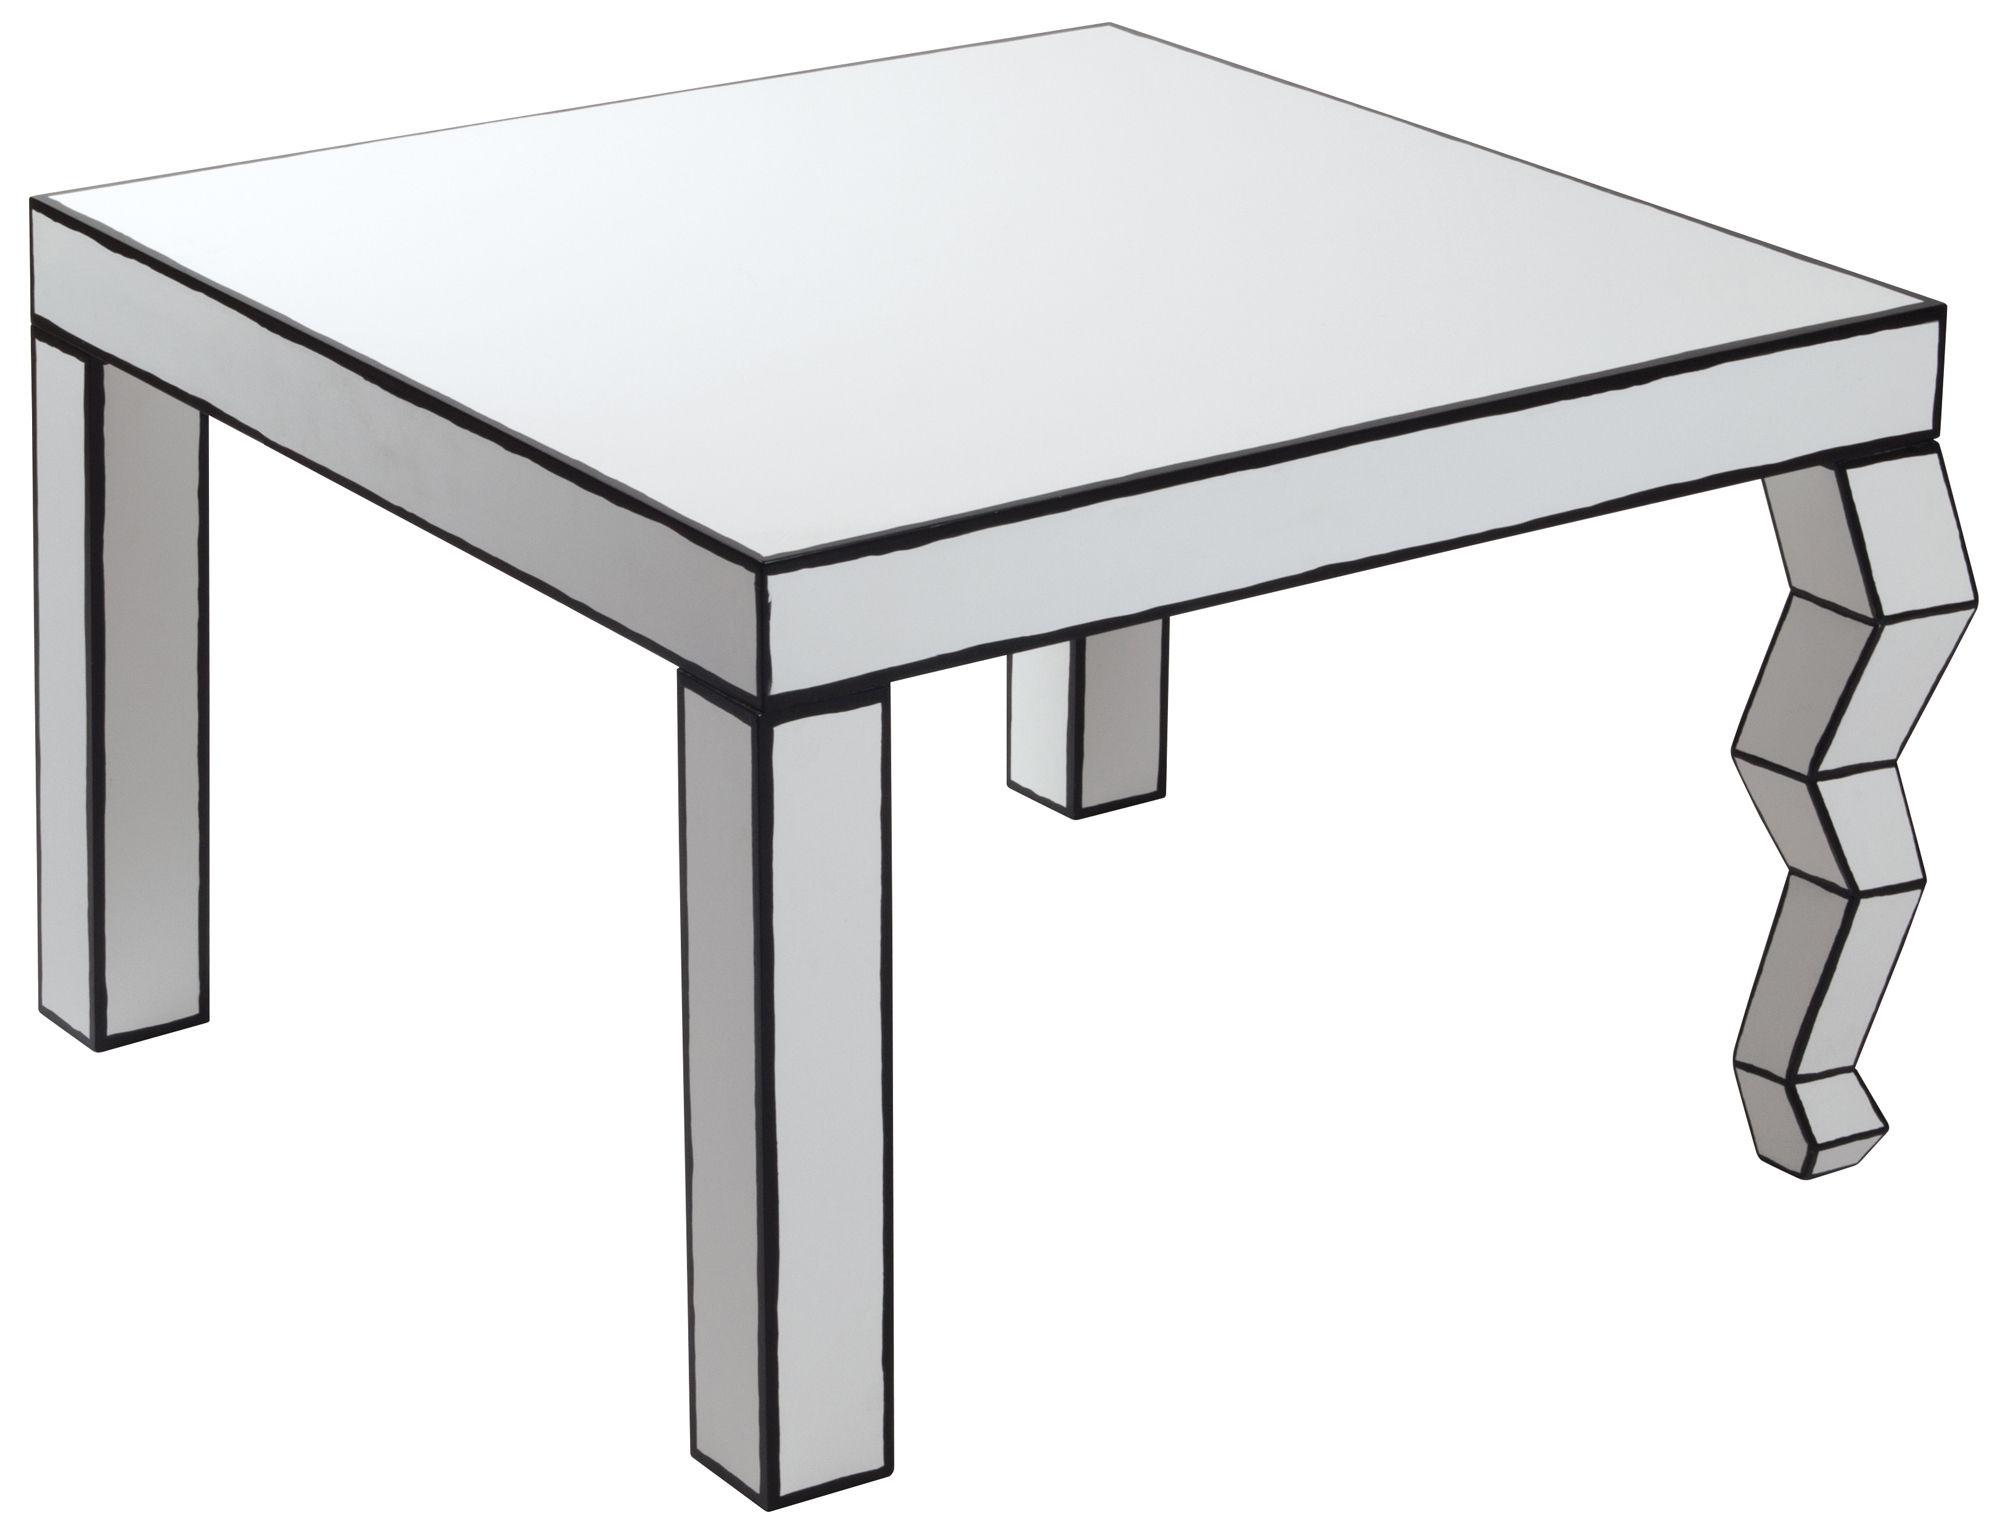 The Trip Cartoon Coffee table Black & white by Seletti